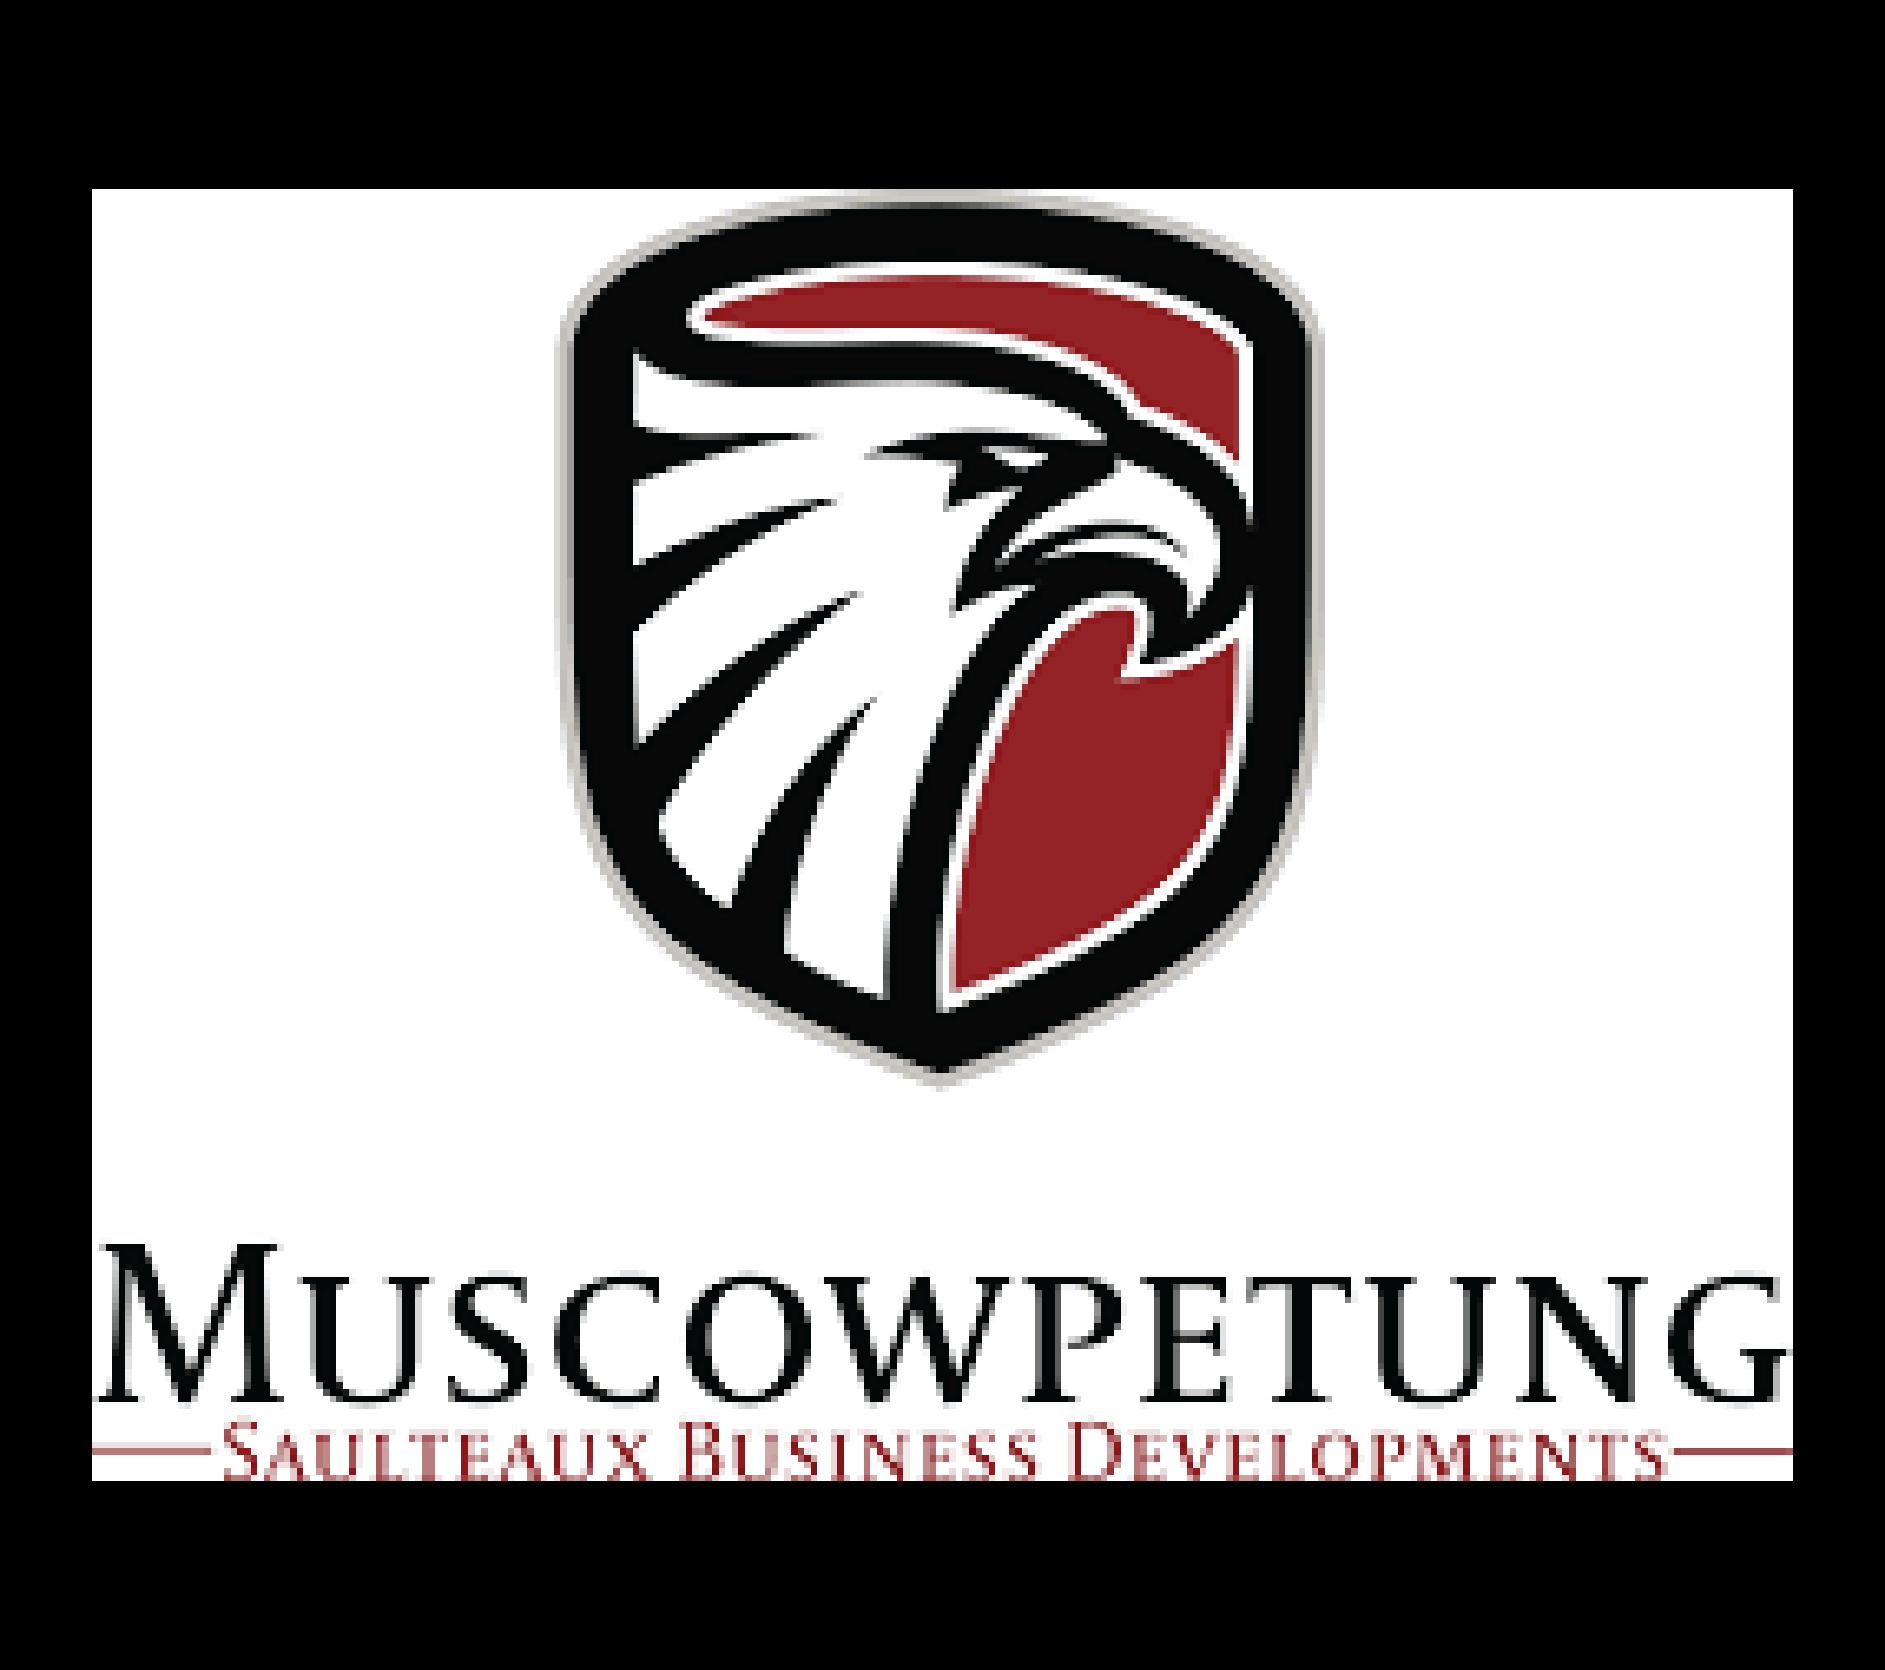 Muscowpetung Haztech_Indigenous Companies